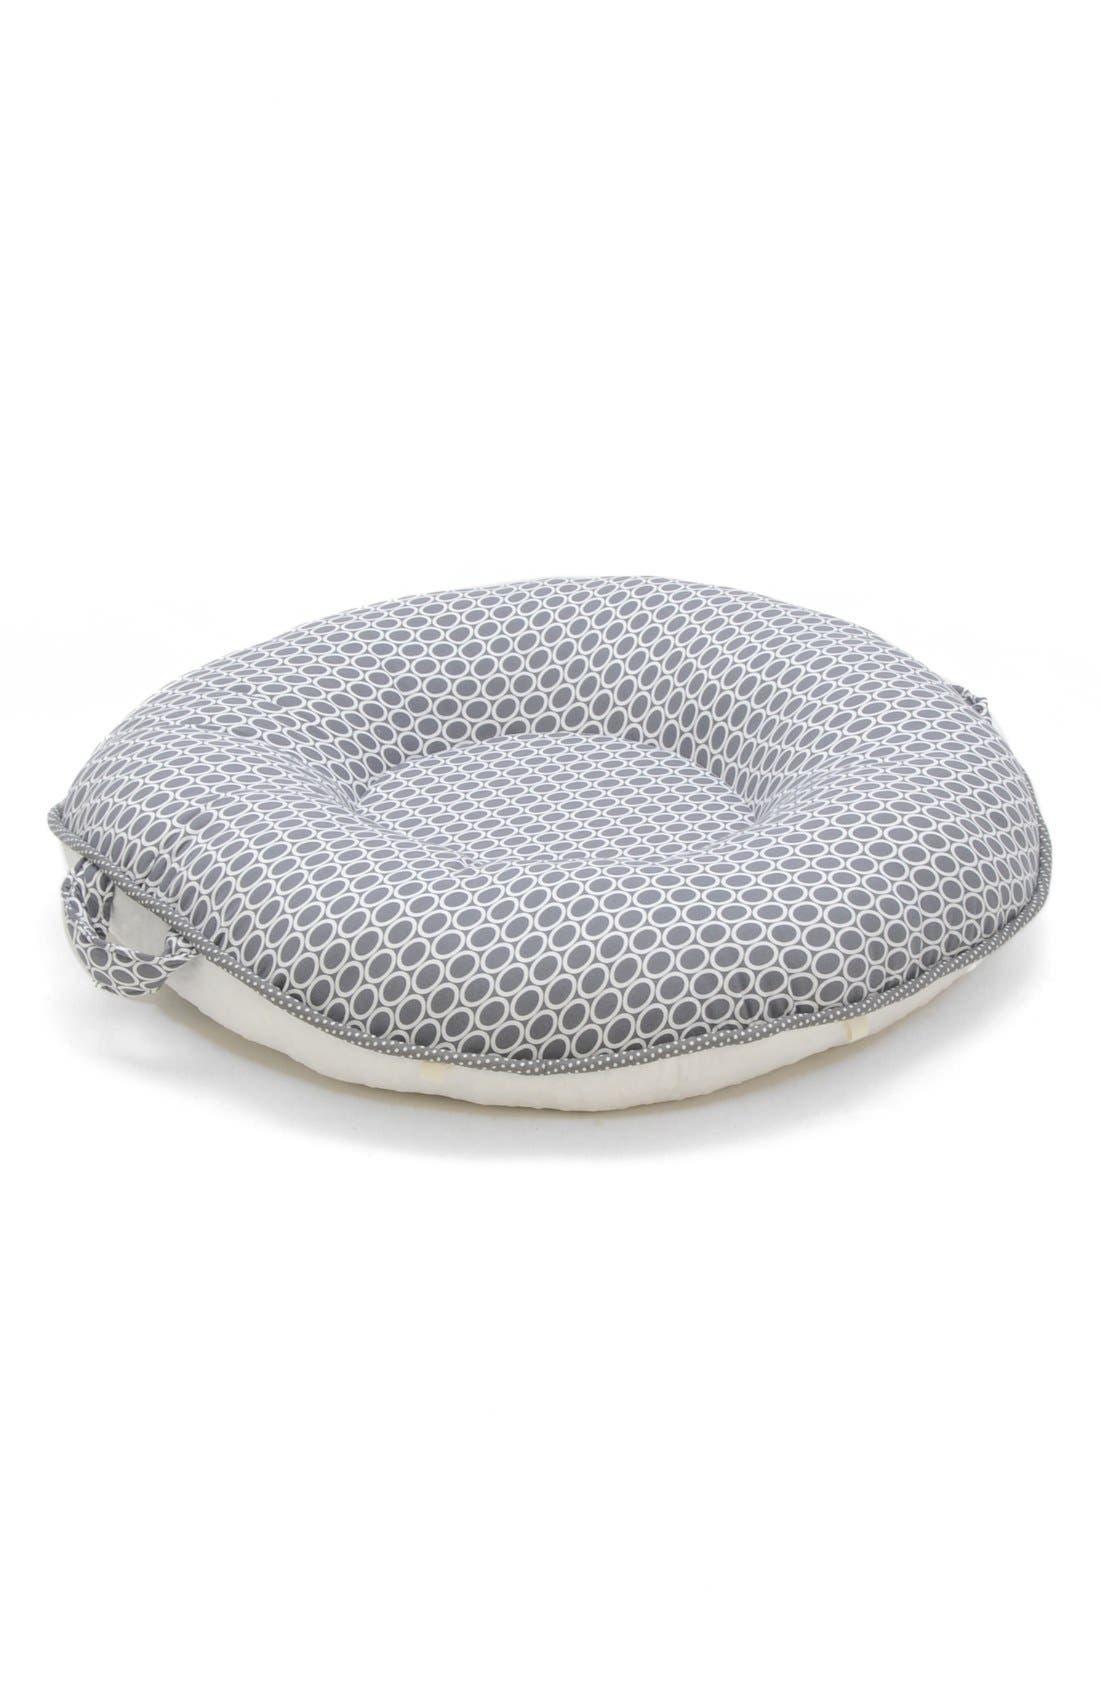 'Majestic' Portable Floor Pillow,                         Main,                         color, 020